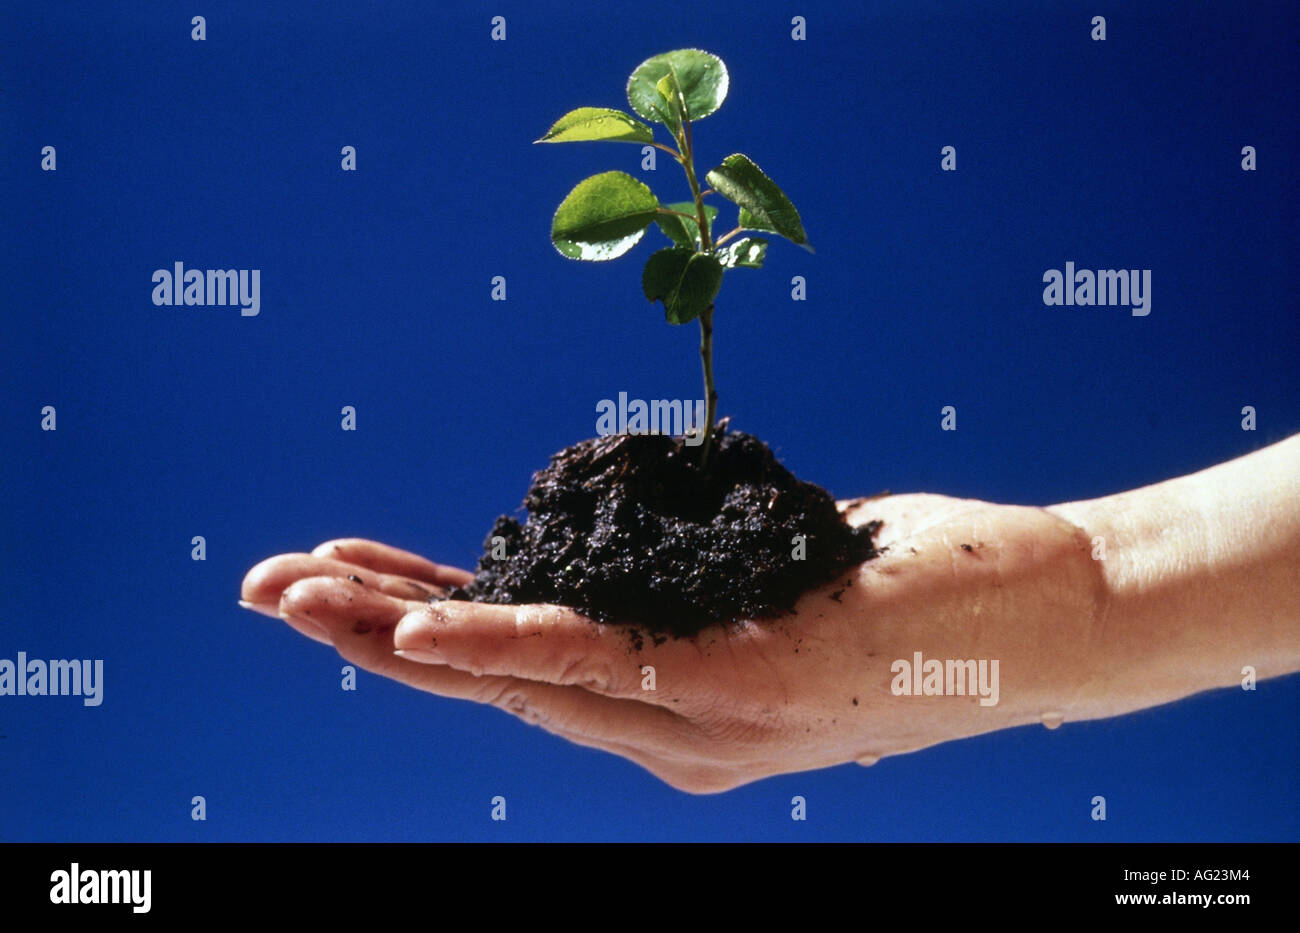 Environment environment protection hand holding soil with environment environment protection hand holding soil with seeding nature plant planting garden gardening symbol seed biocorpaavc